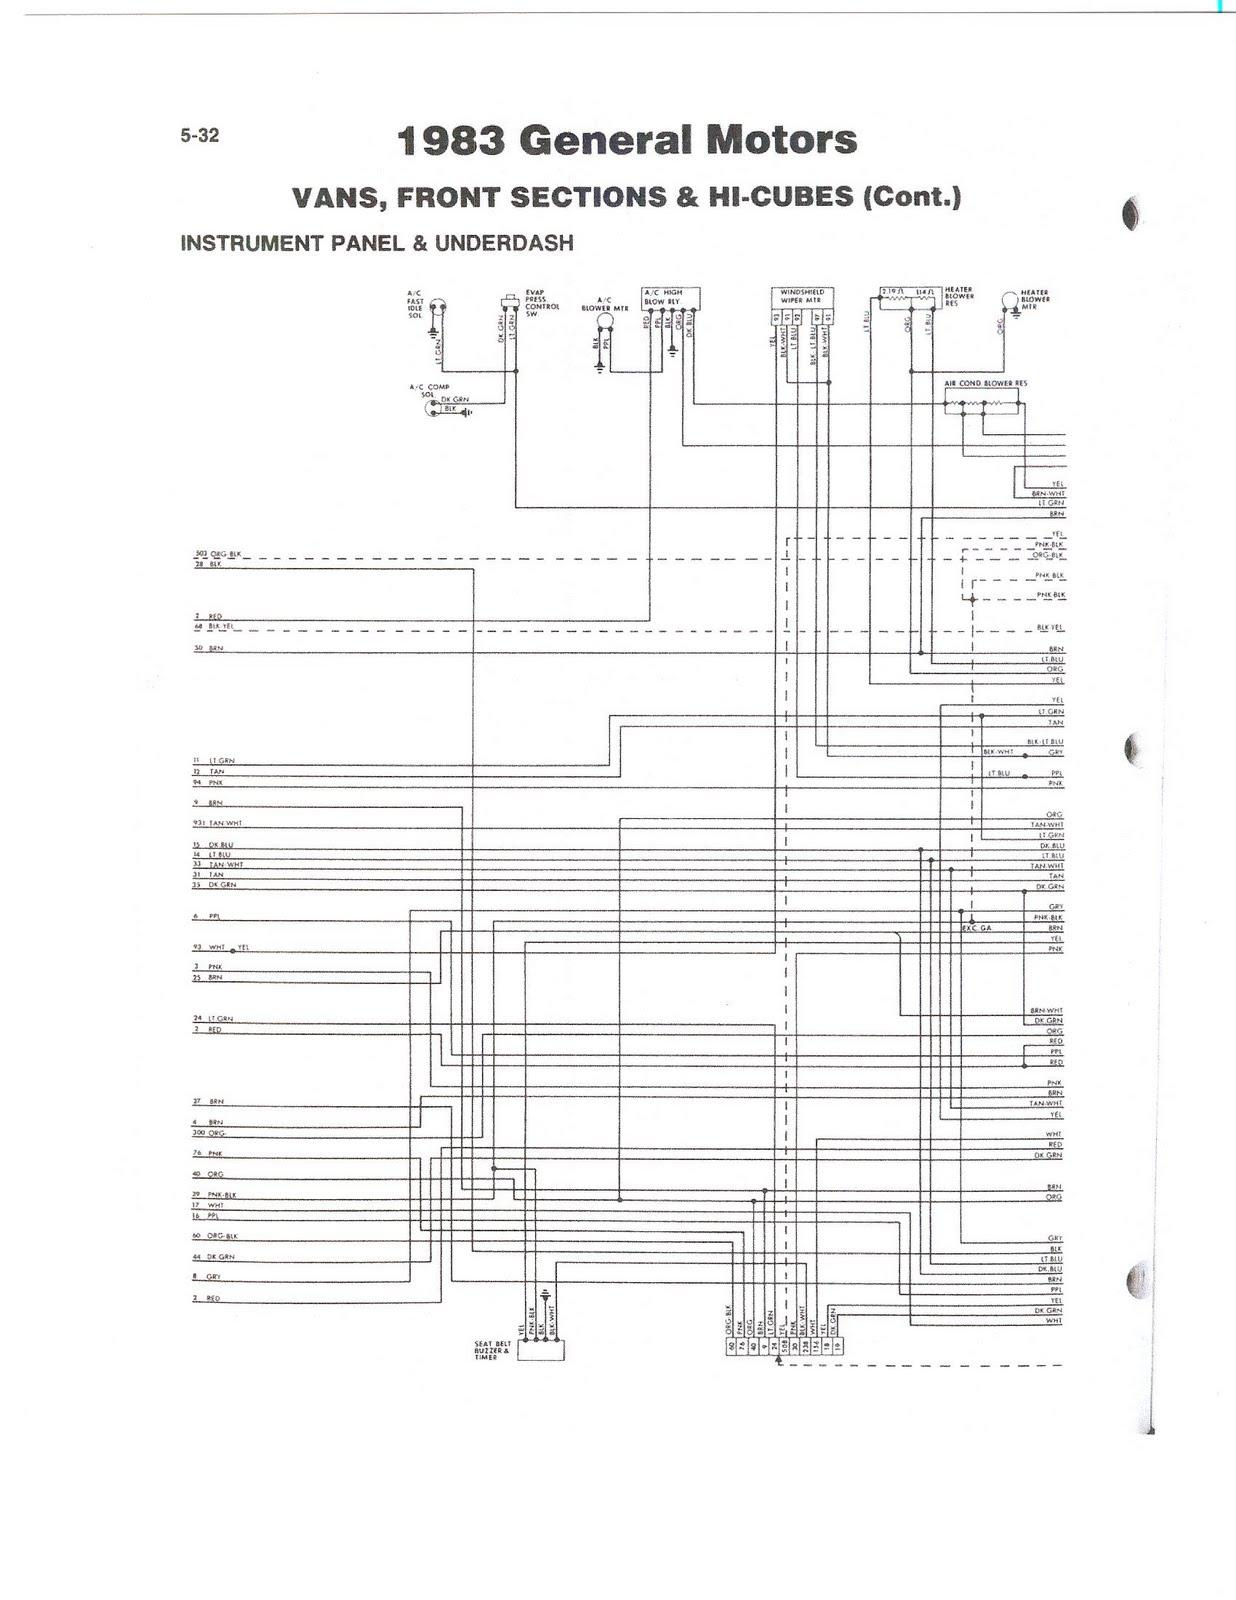 83 Fleetwood Wiring Diagram Diy Wiring Diagrams \u2022 Fleetwood Discovery  Motorhome Parts Fleetwood Discovery Motorhome Wiring Diagram